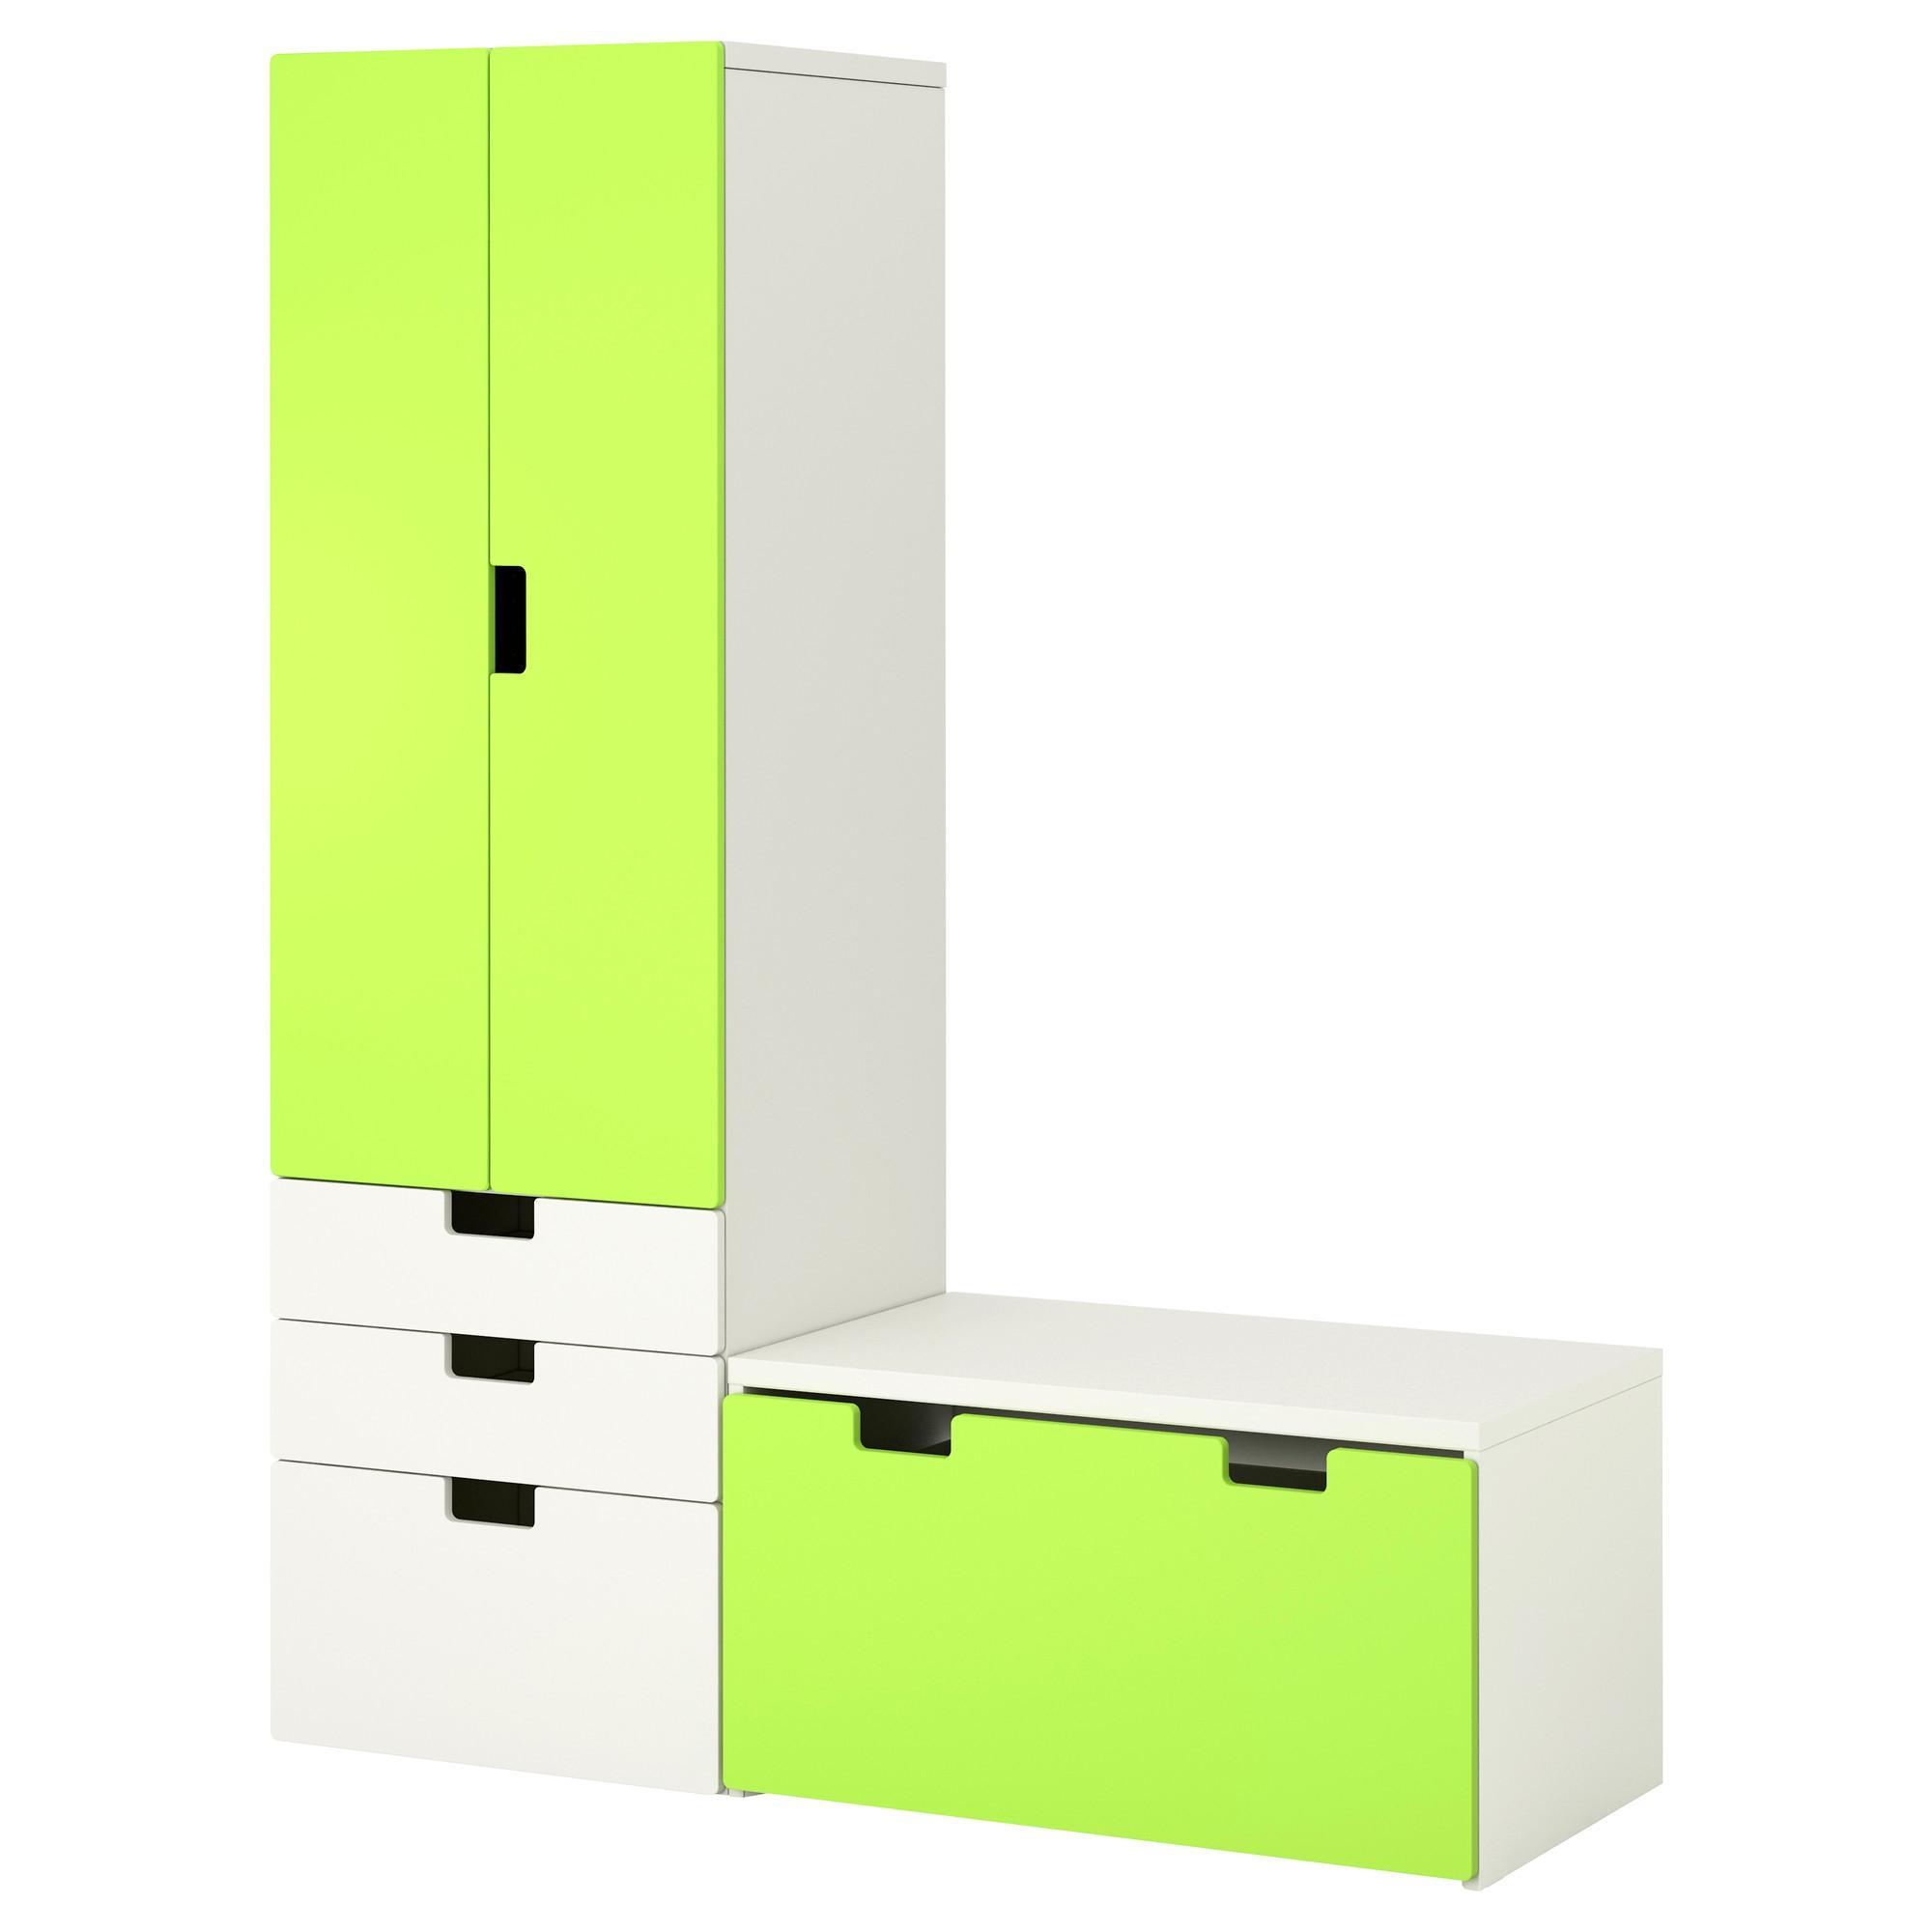 Stuva combinaci n almacenaje banco - Ikea ninos almacenaje ...